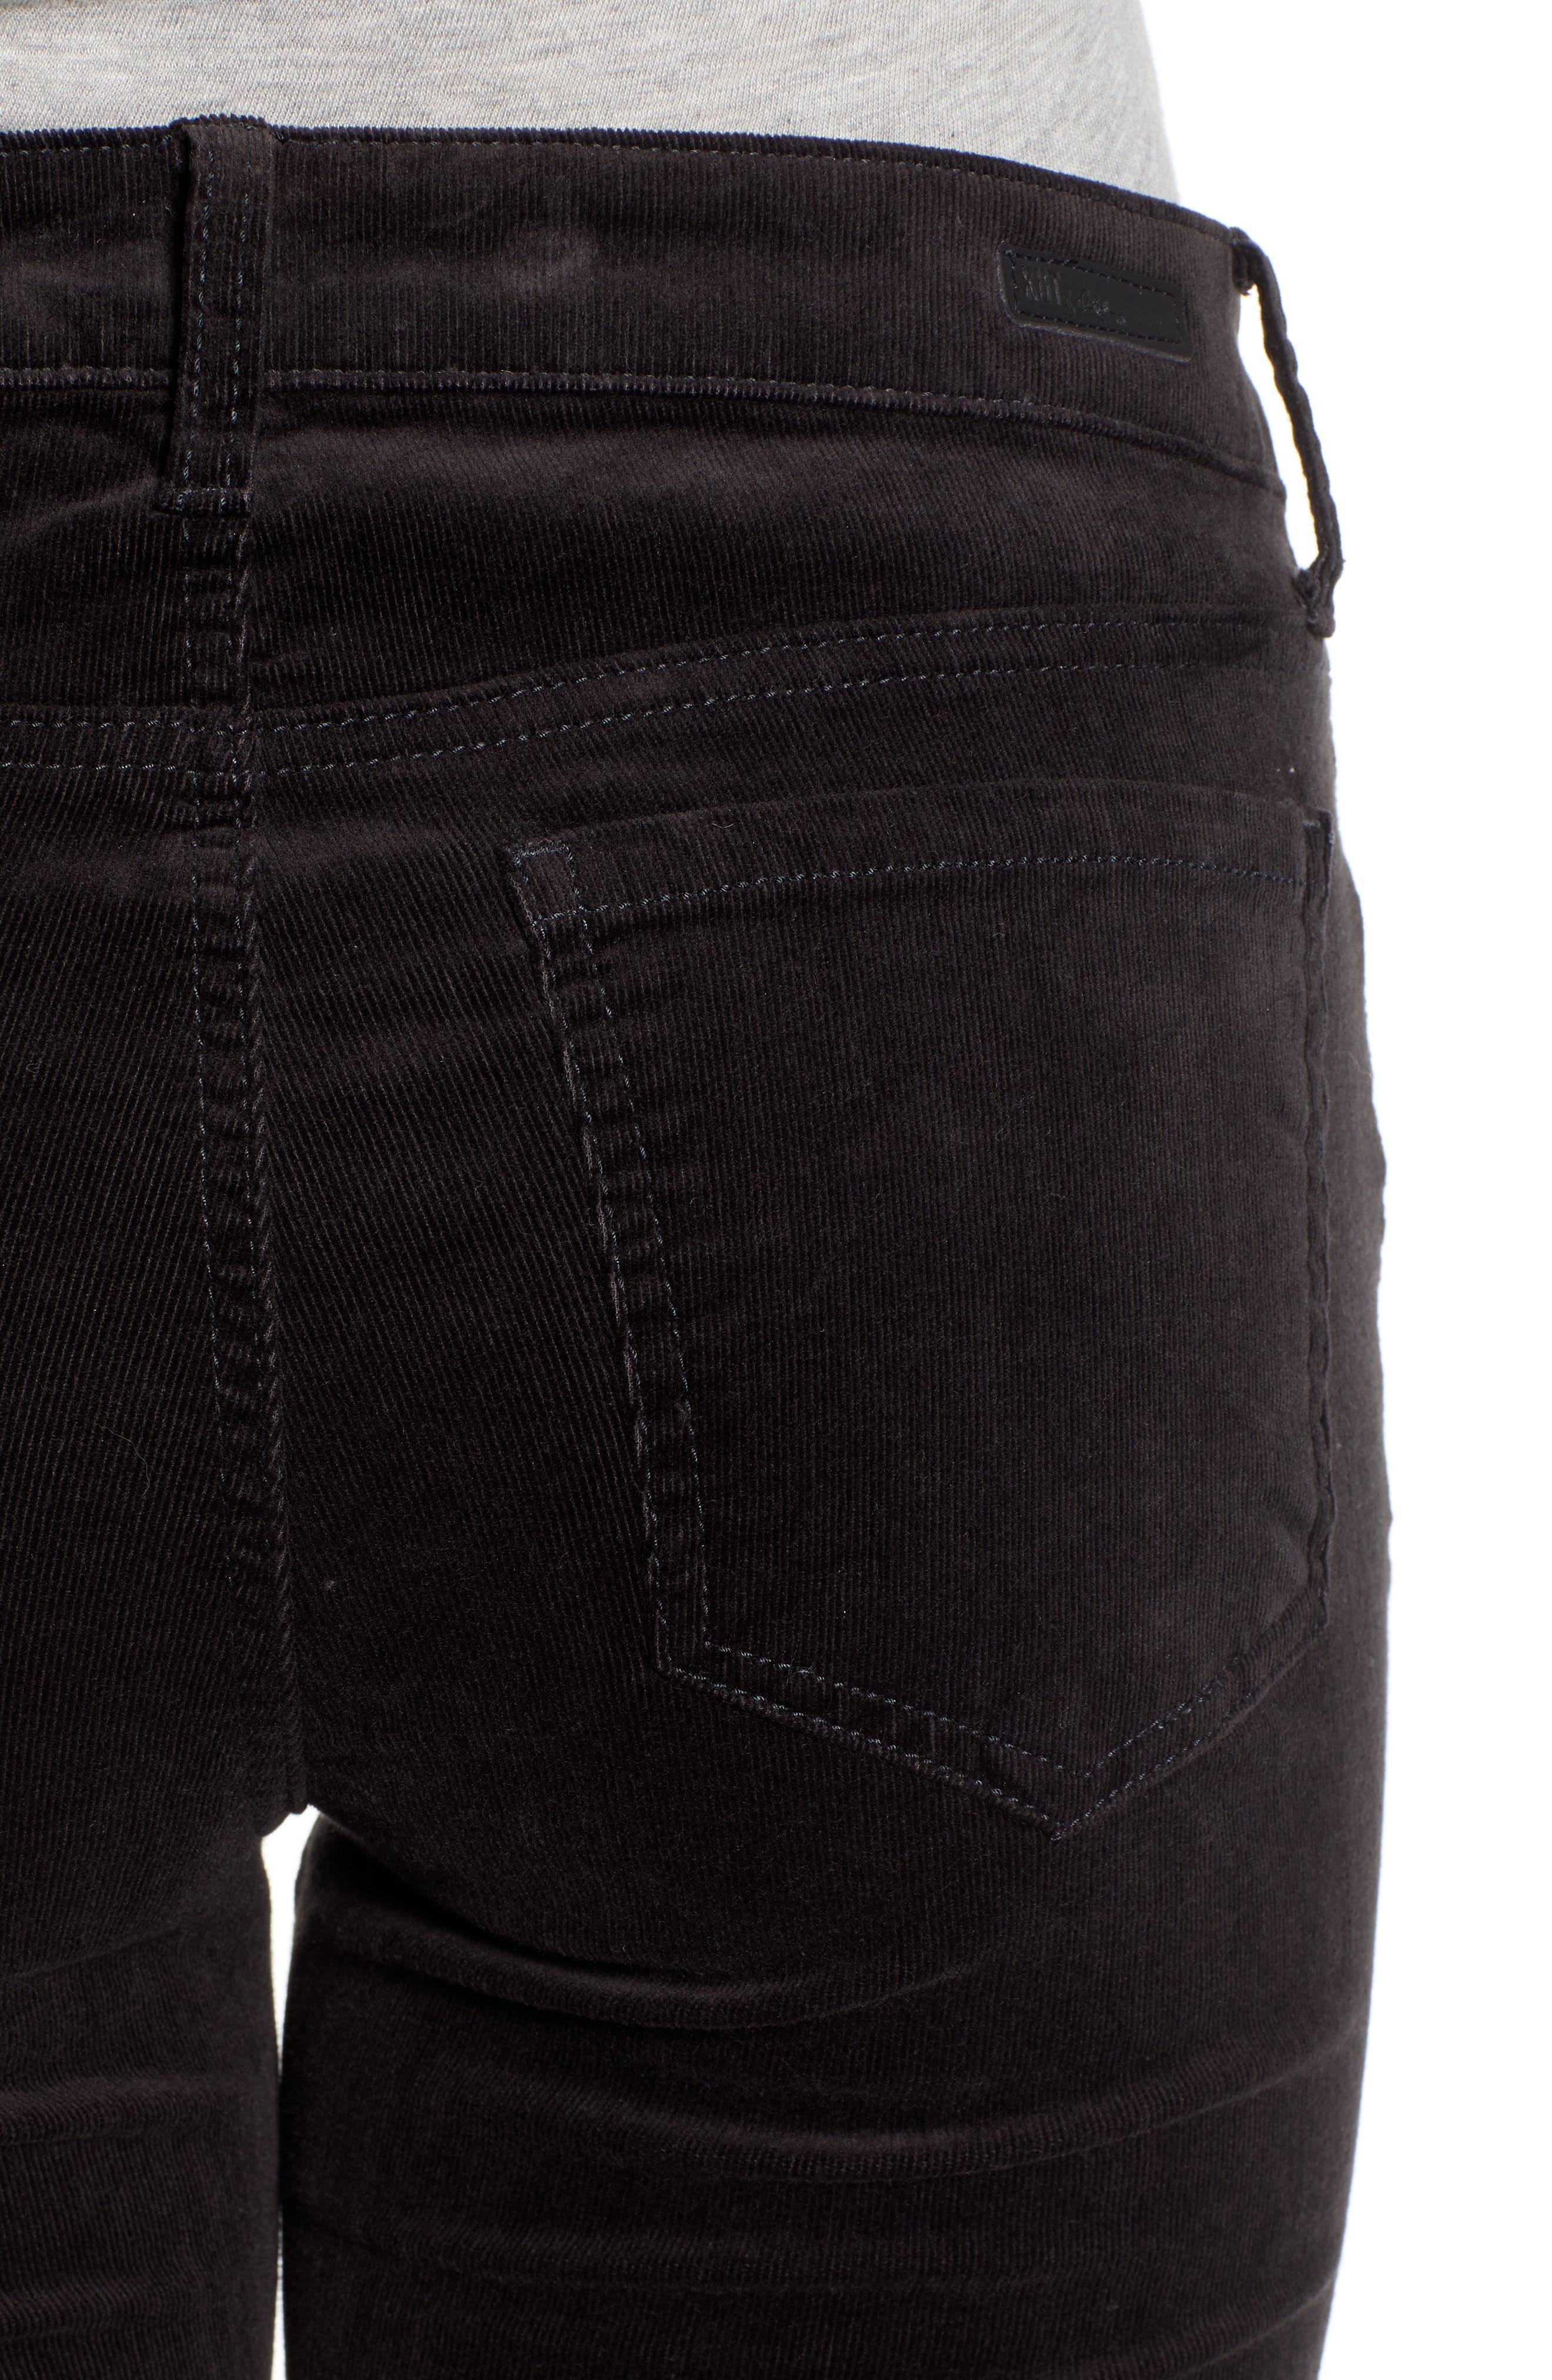 'Diana' Stretch Corduroy Skinny Pants,                             Alternate thumbnail 208, color,